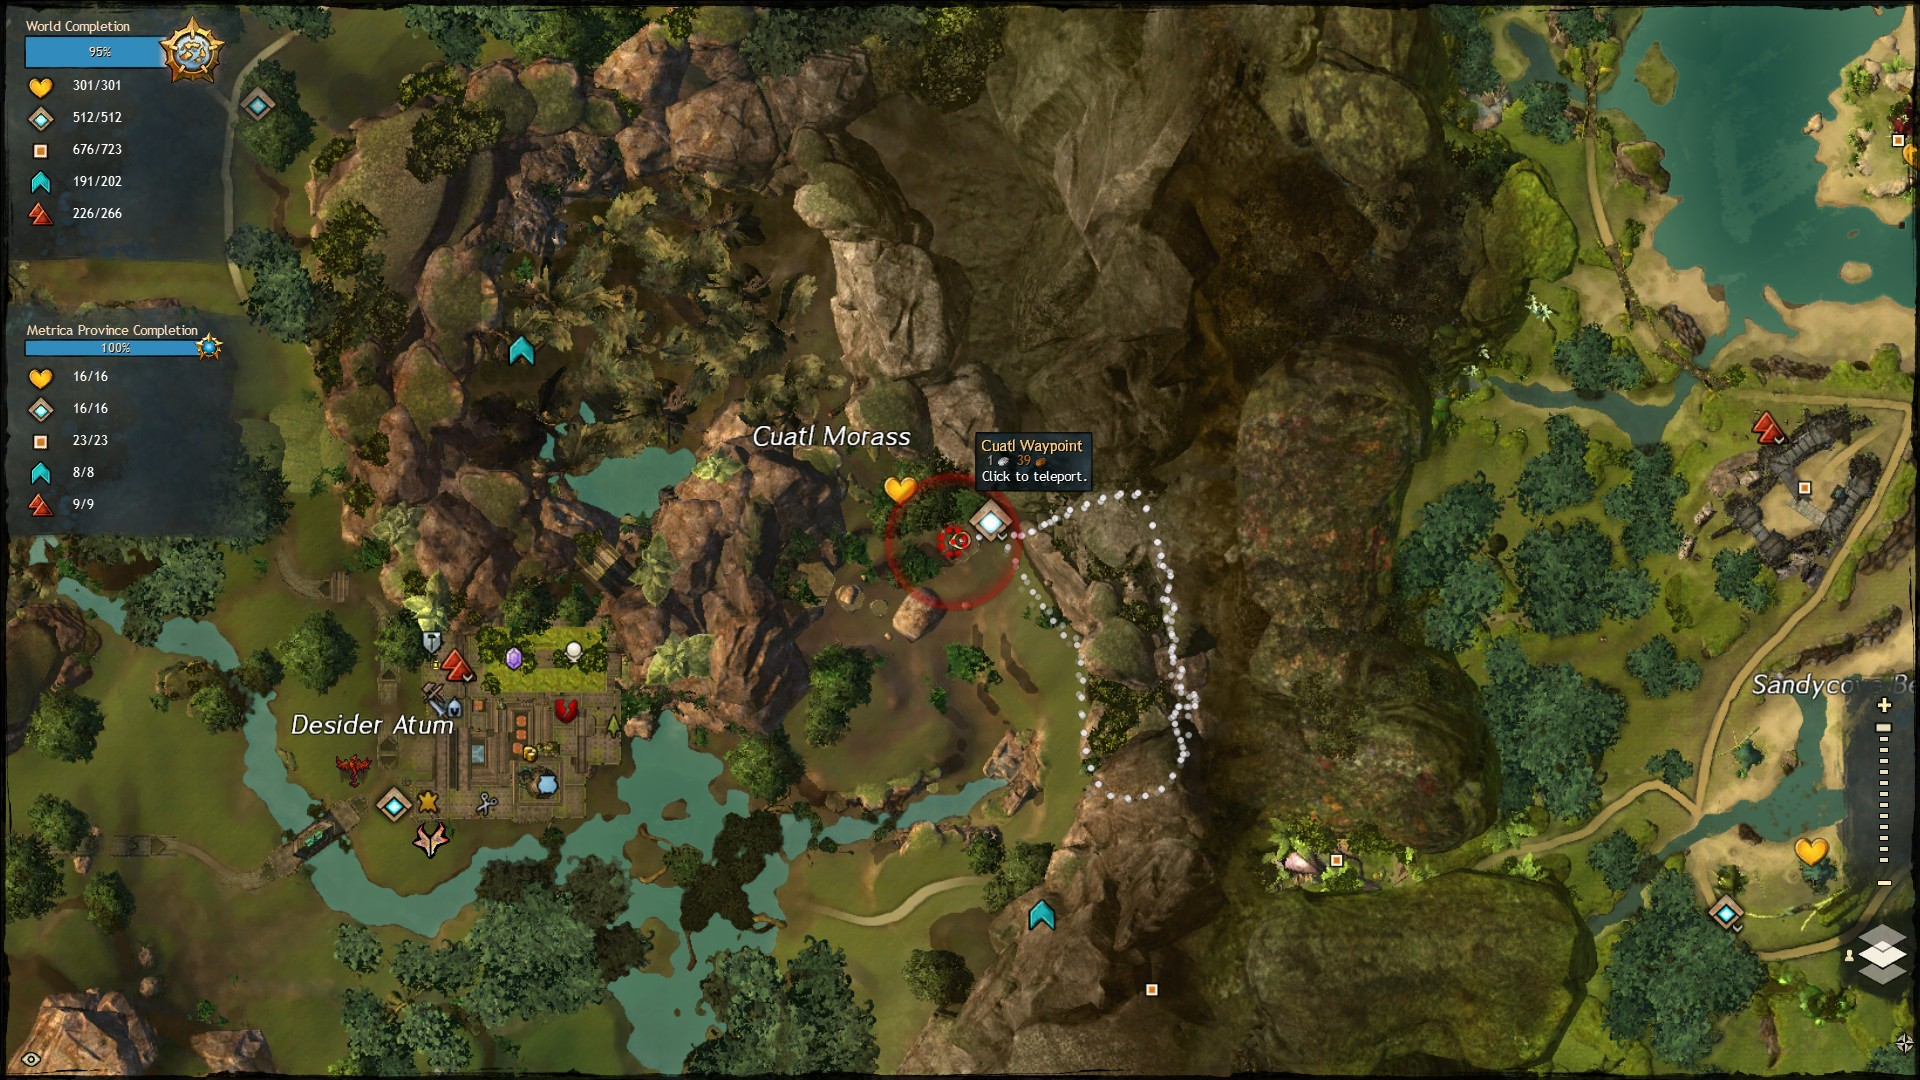 GW2 Sky Pirate Cache Achievement guide - Guild Wars 2 Life